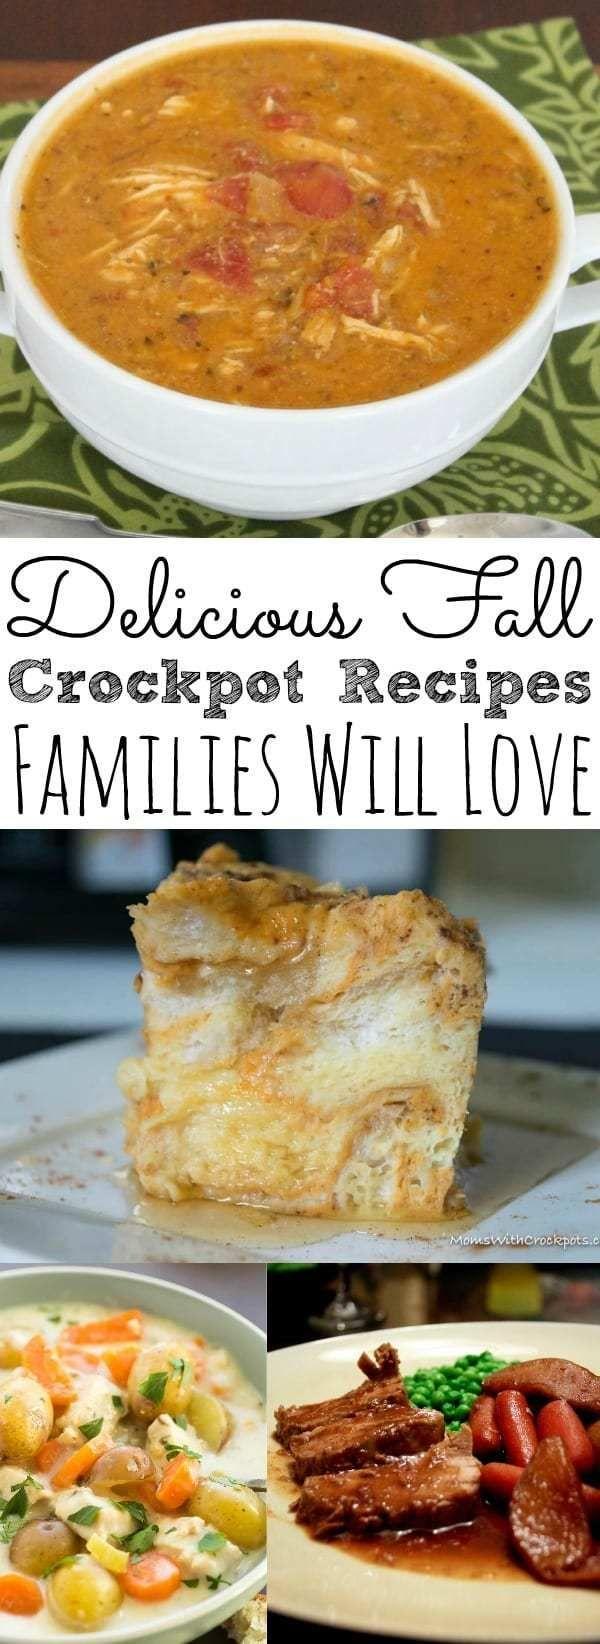 Delicious Fall Crockpot Recipes images